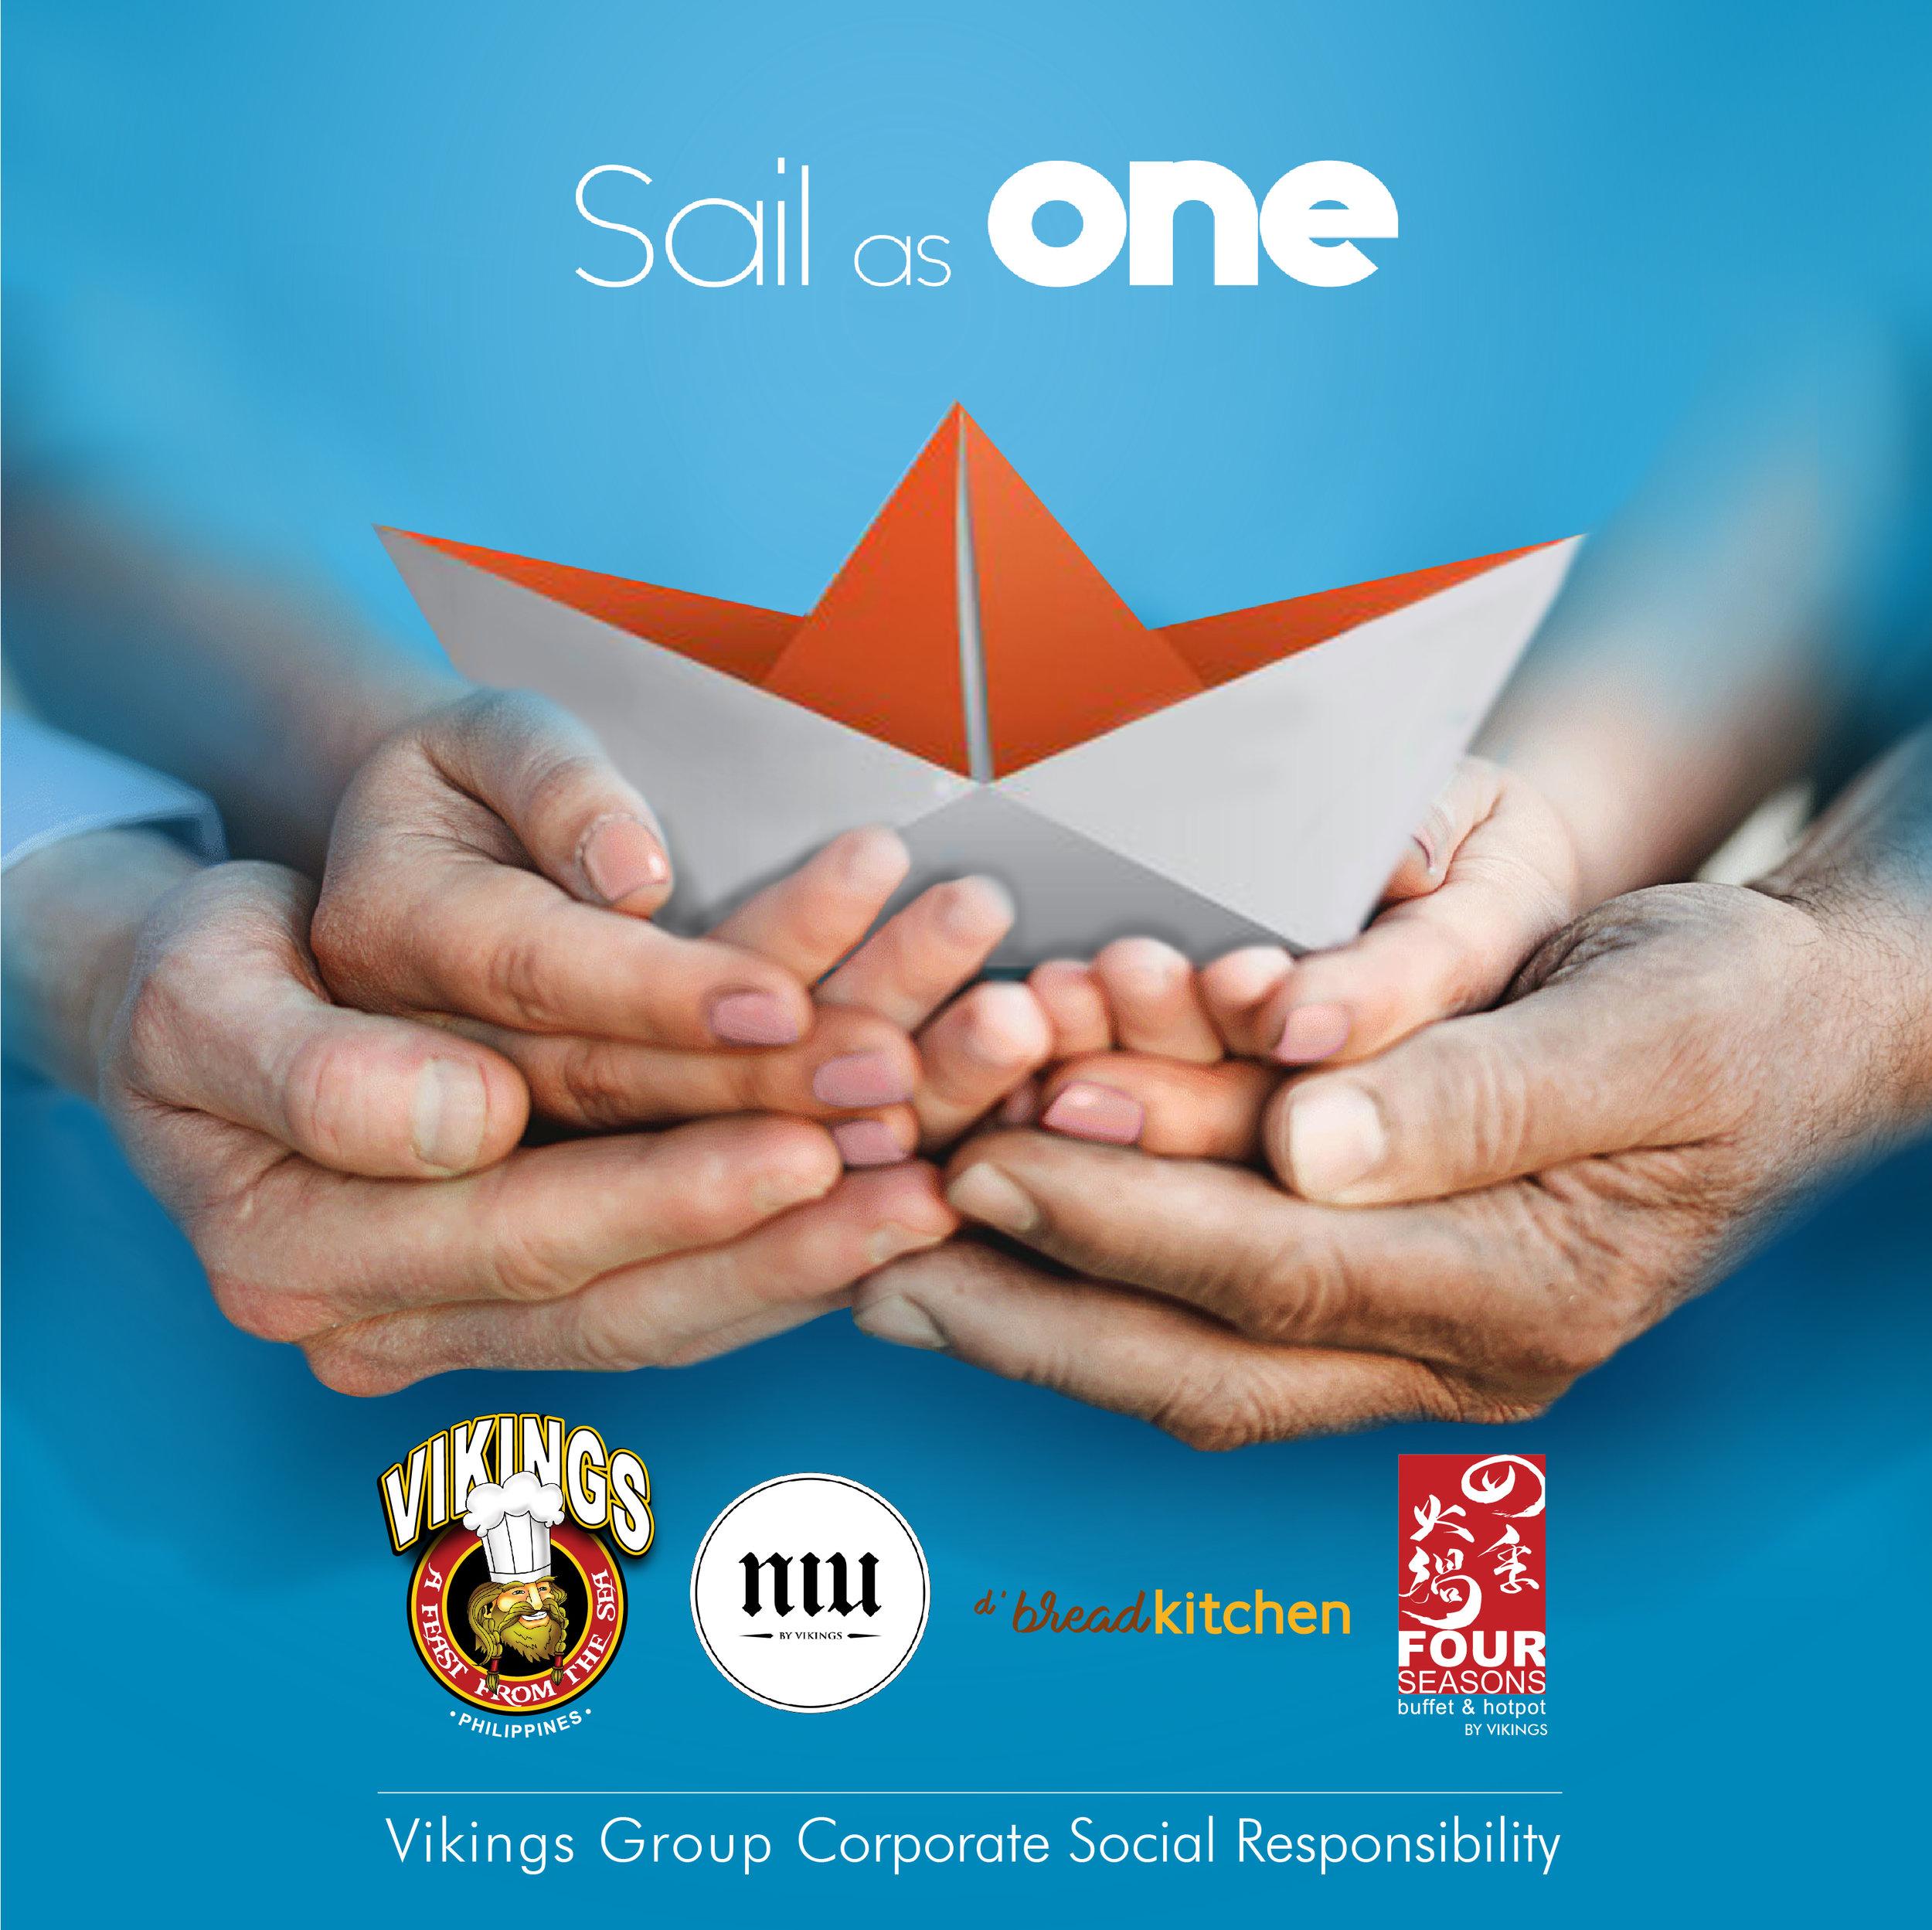 FA_Vikings Group_Sail as one_fb_5x5-01.jpg